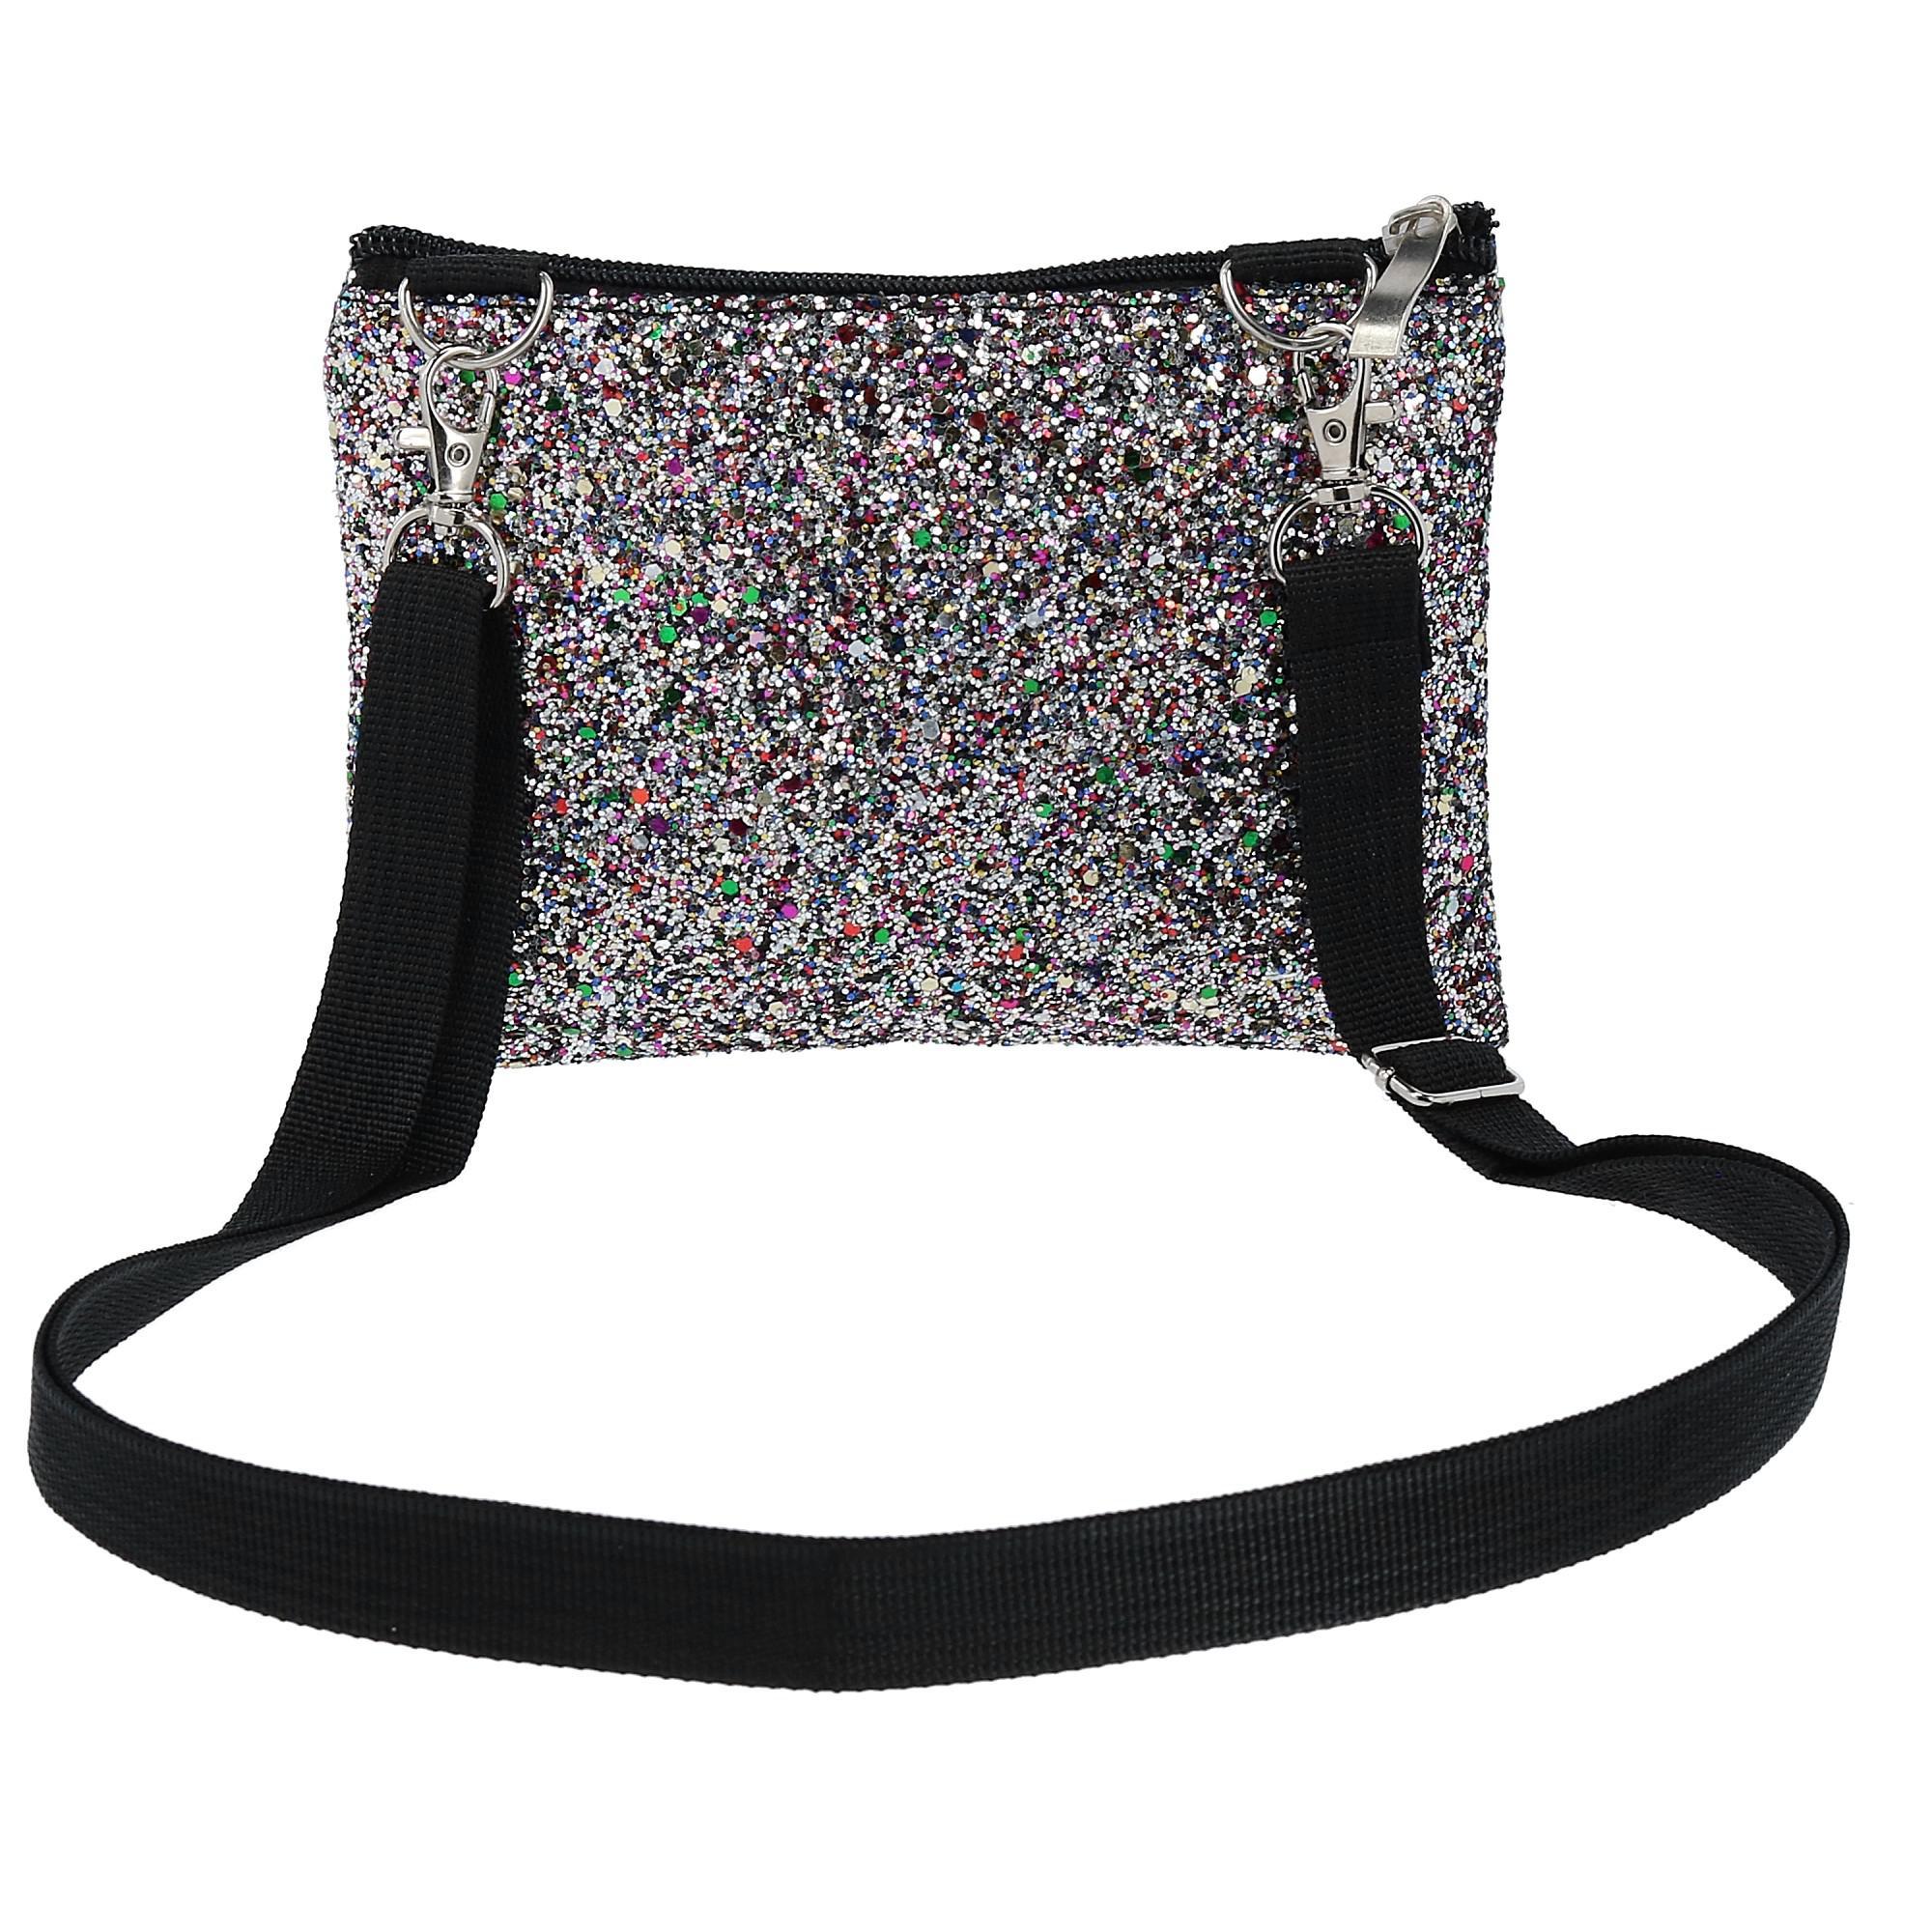 New-2-Moda-Fashion-Glitter-Waist-Pack-Convertible-Cross-Body-Bag thumbnail 13